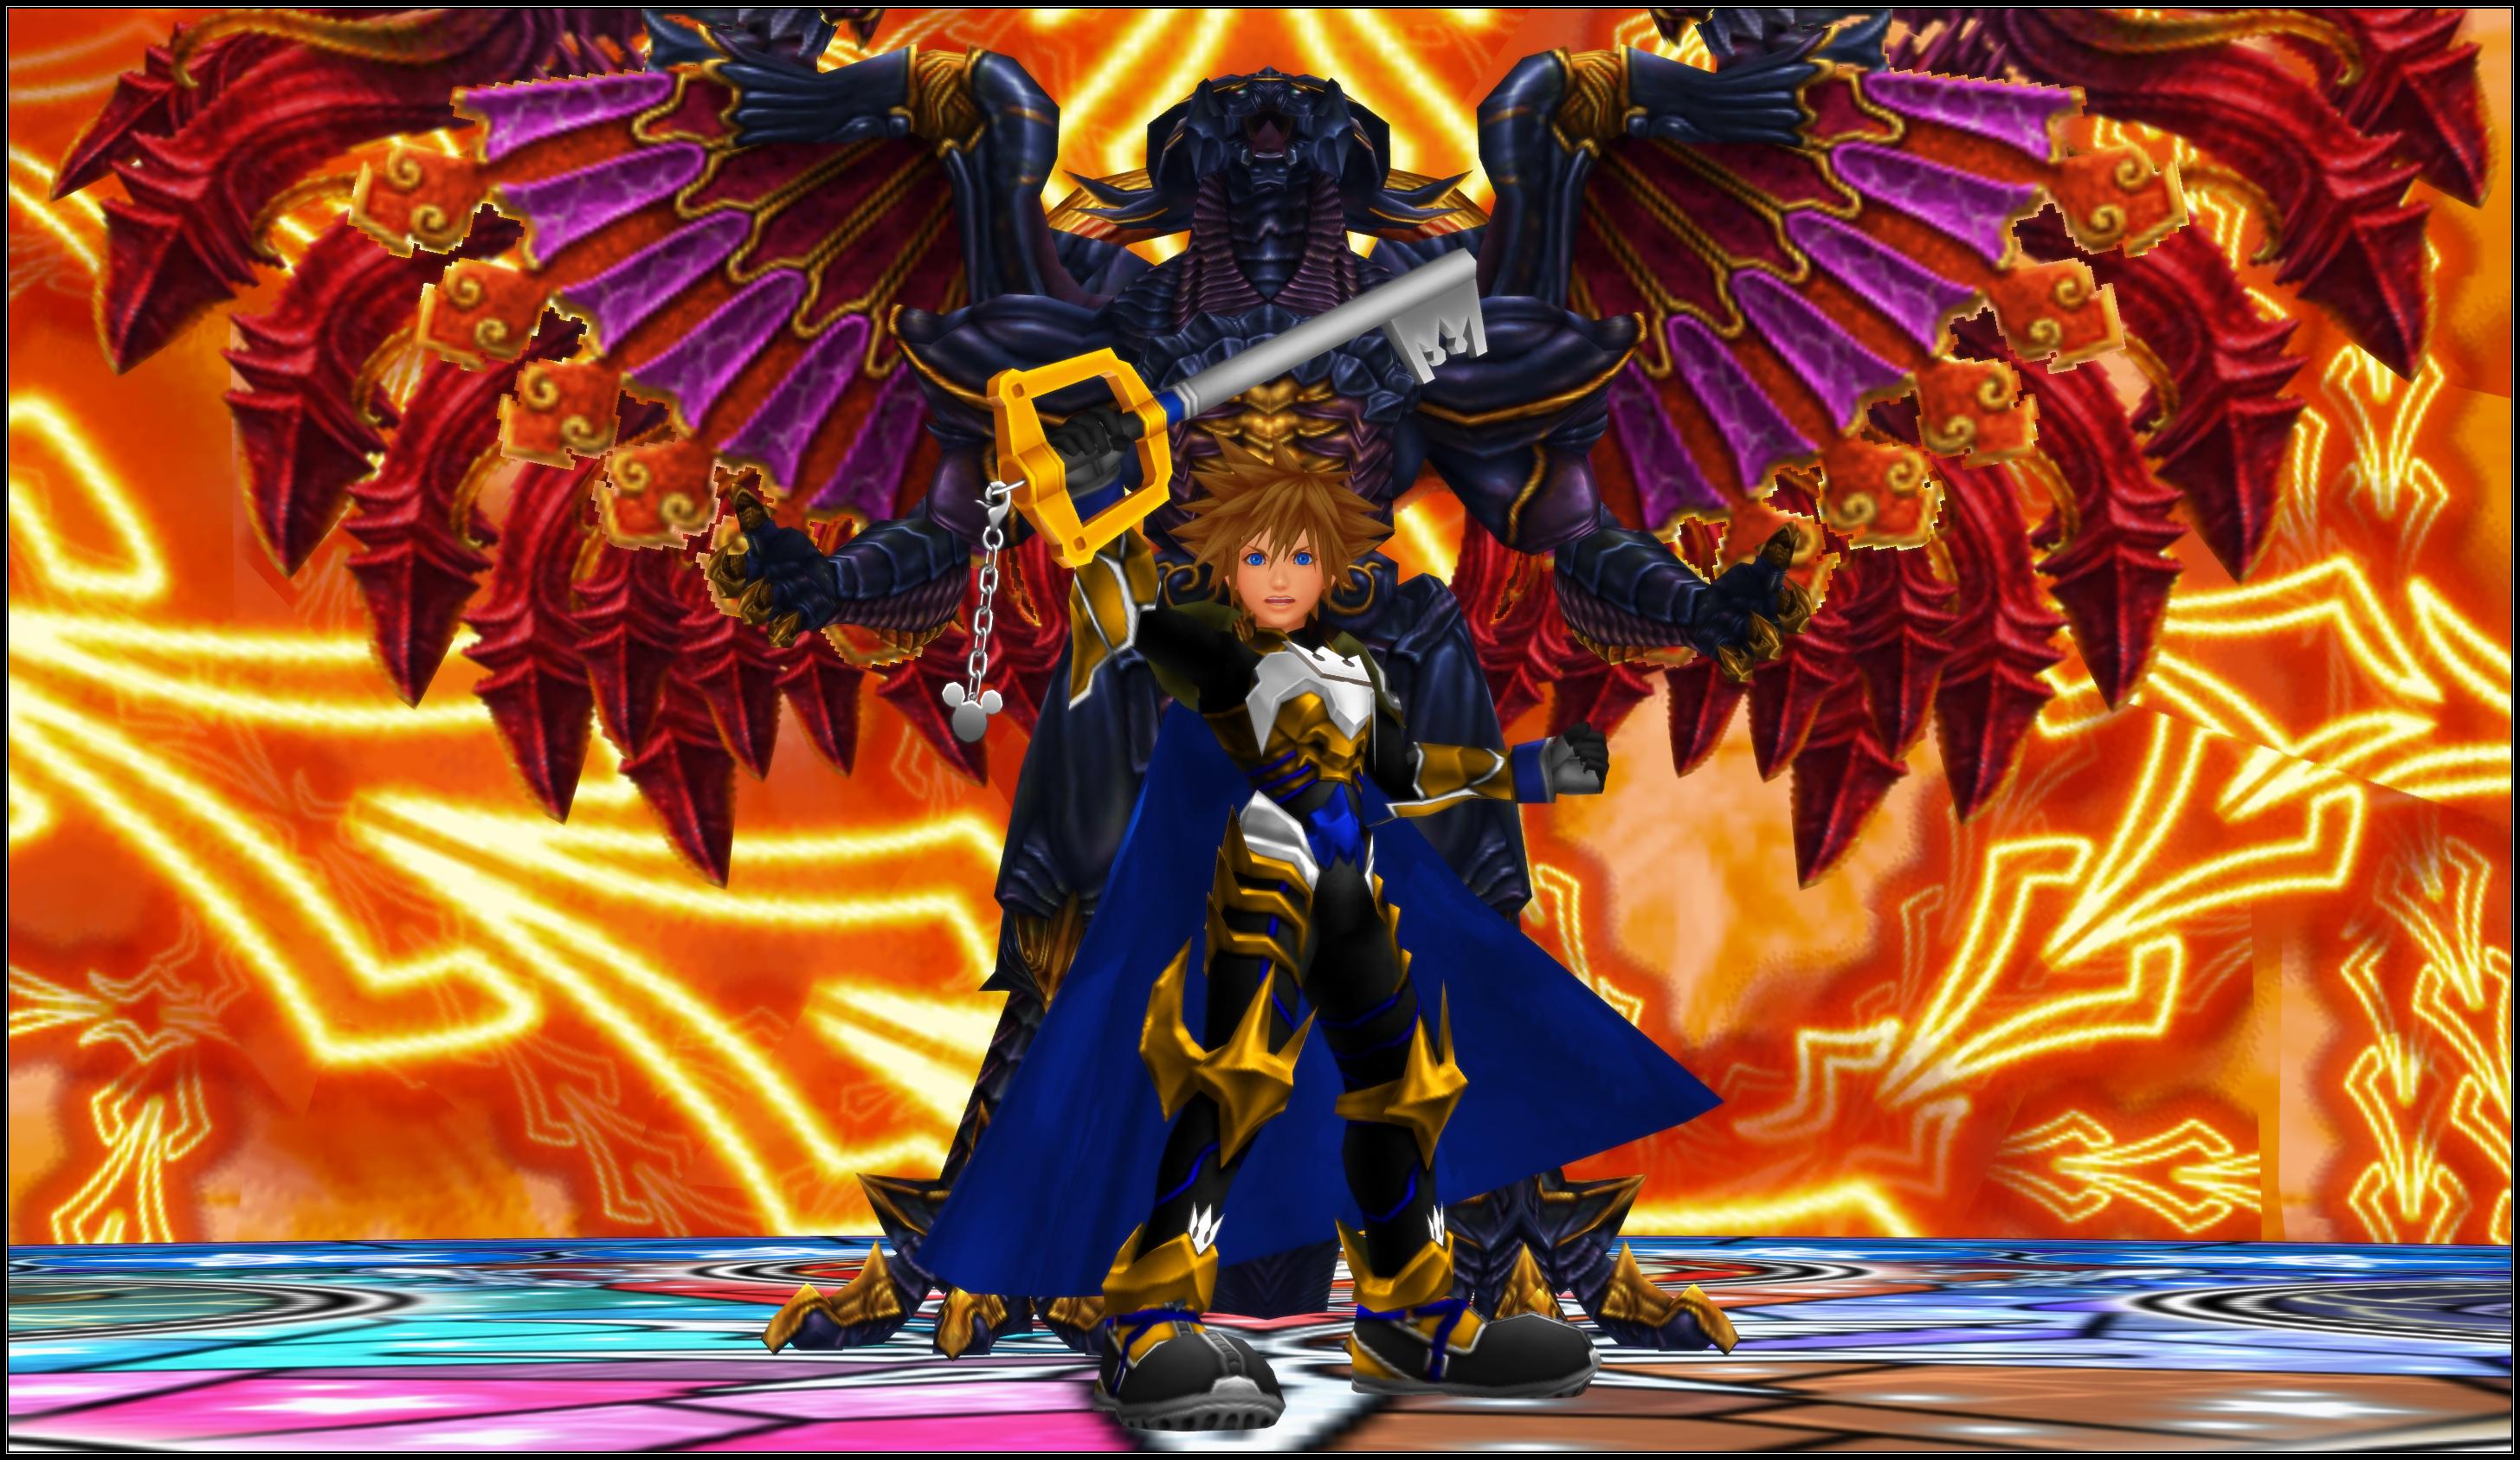 Kh3 Summoning The Dragon King By Todsen19 On Deviantart